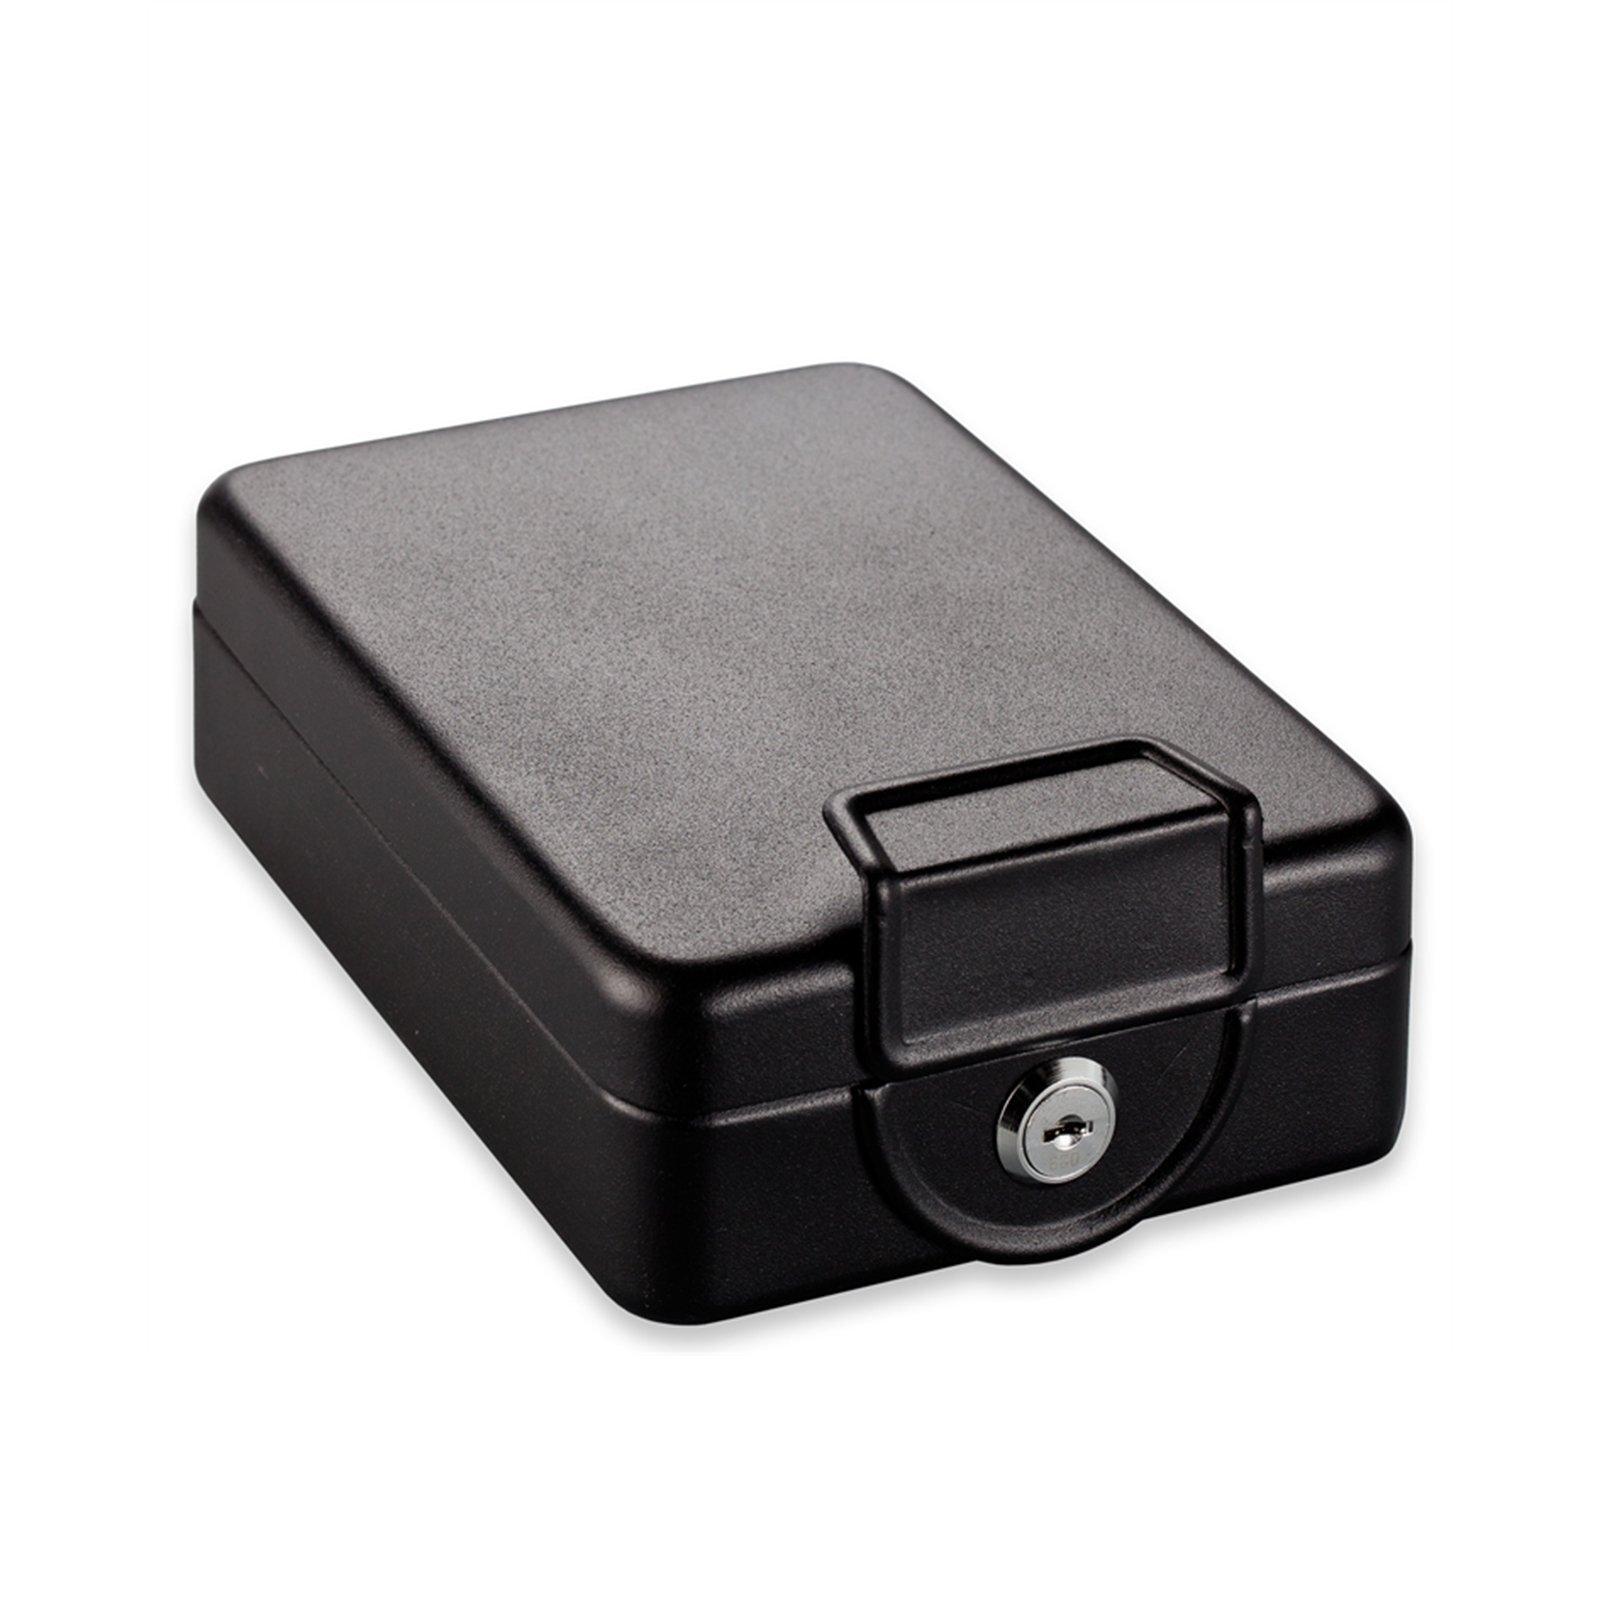 Sandleford 210 x 155 x 55 Safety Box